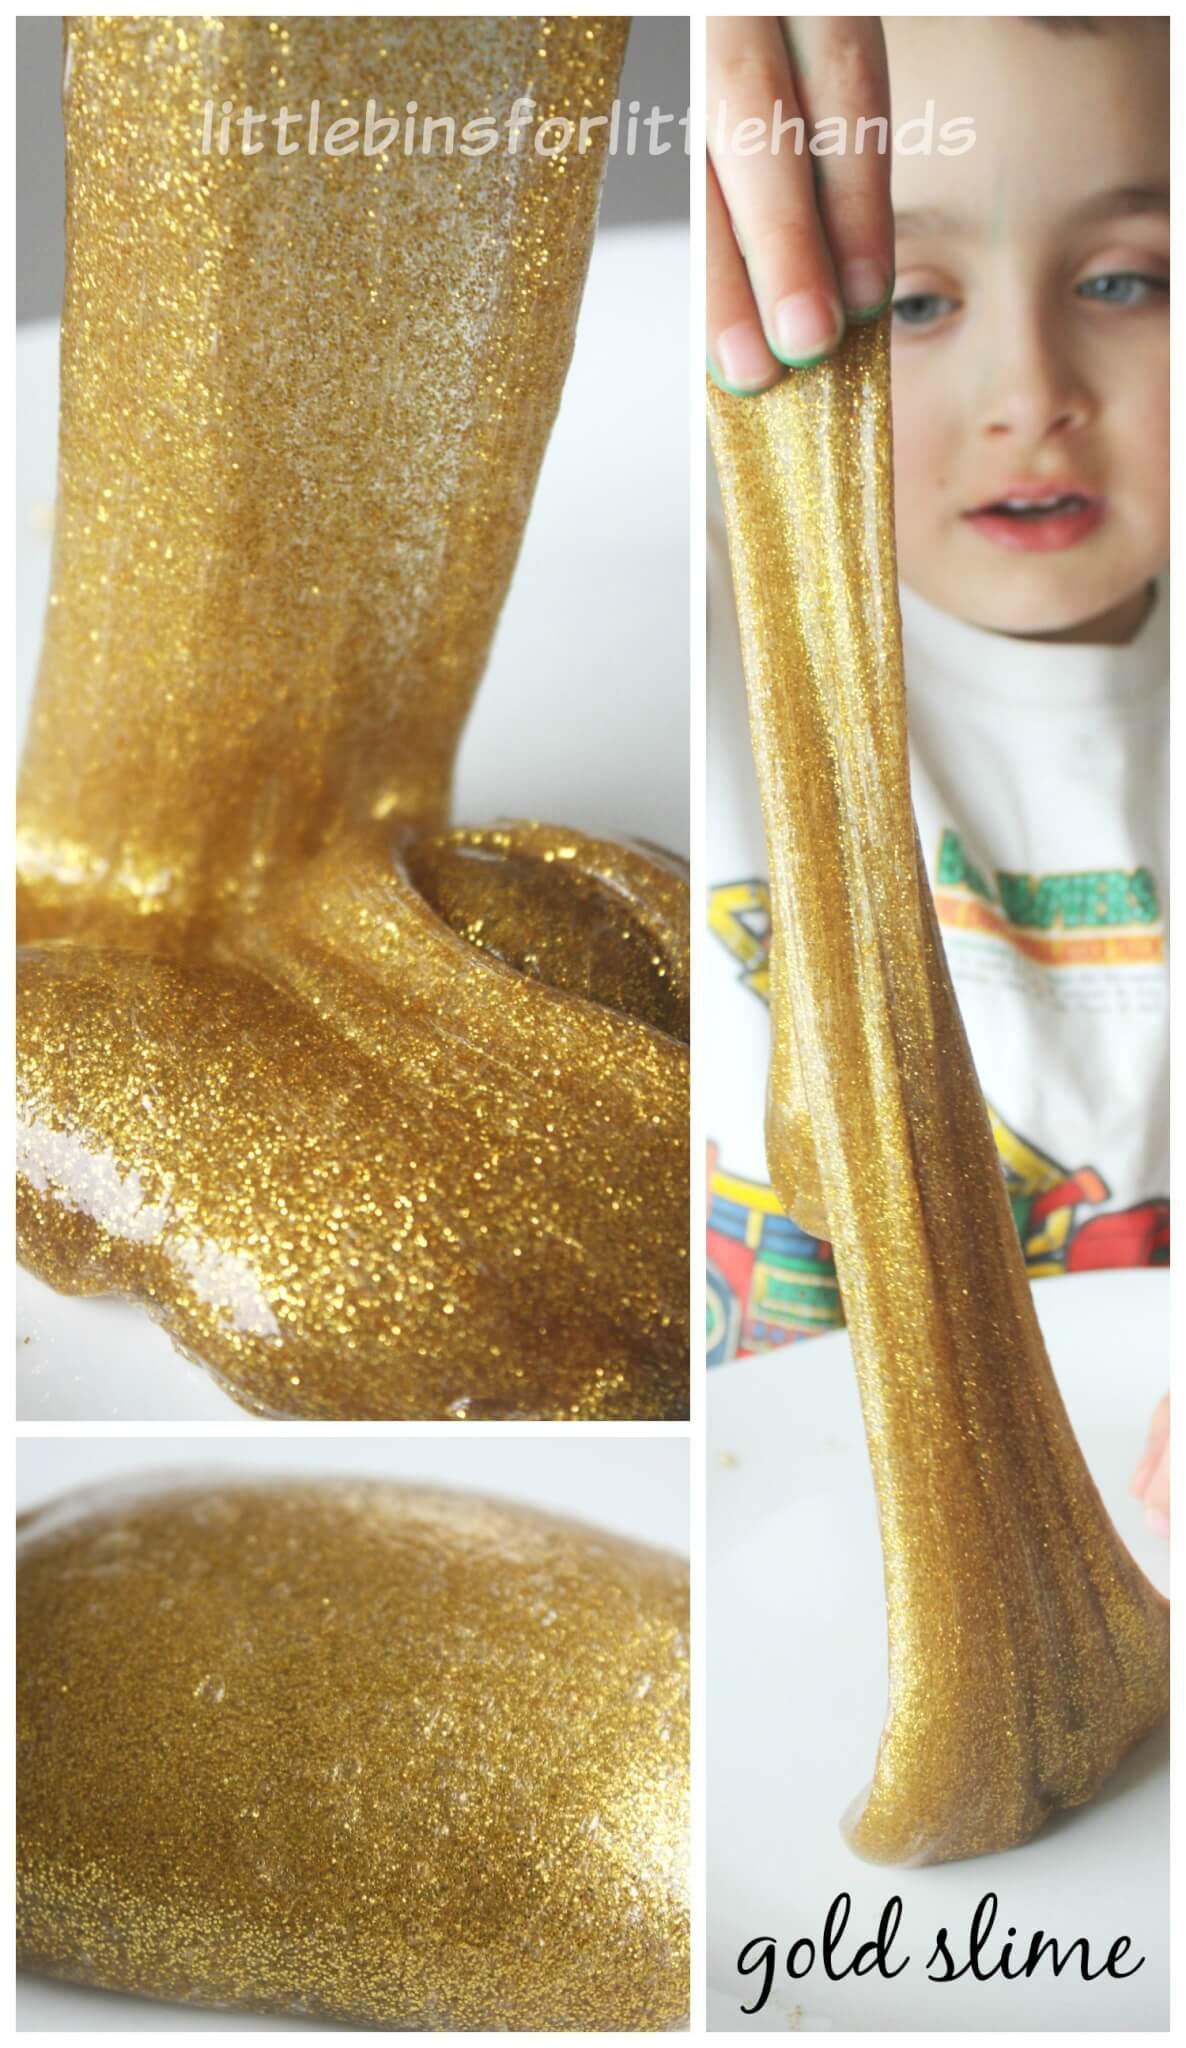 Gold Slime Recipe Glitter Glue Slime Sensory Play